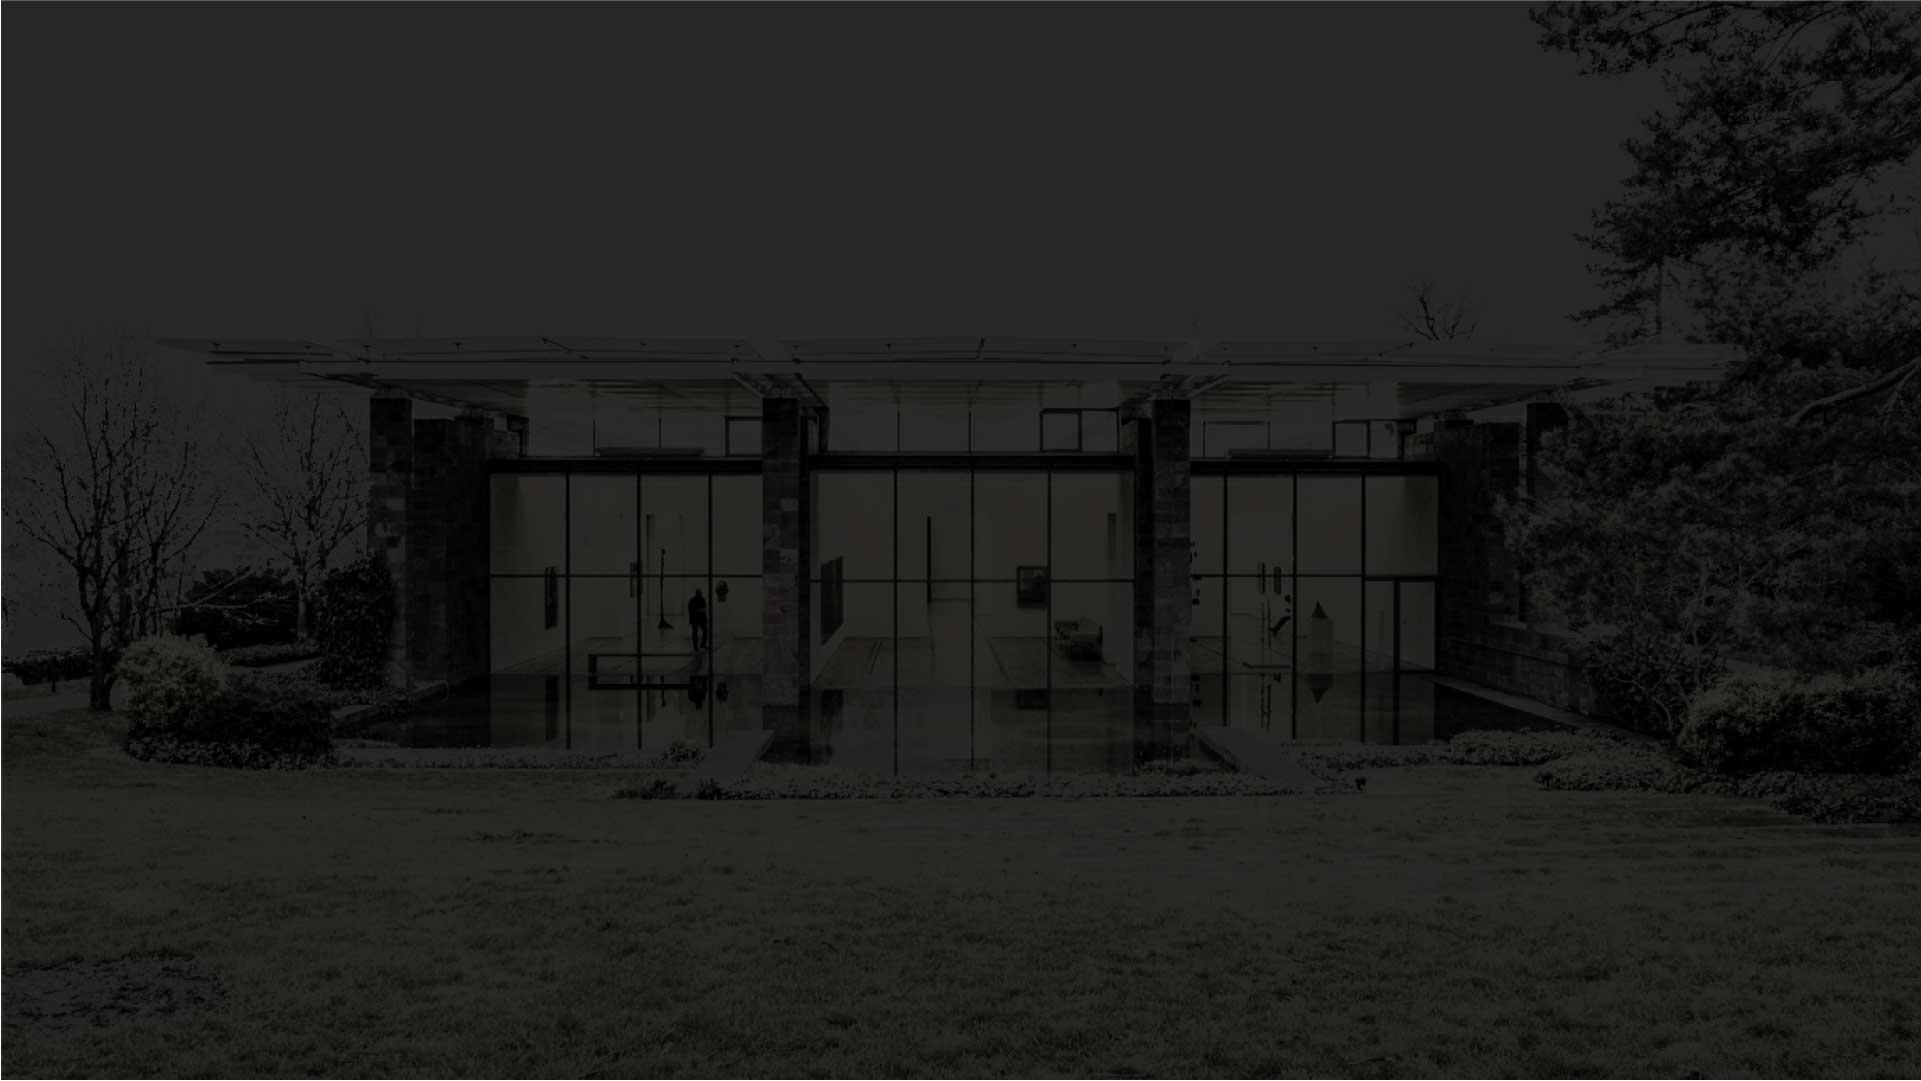 Wider View Portfolio Architettura in Svizzera Anteprima